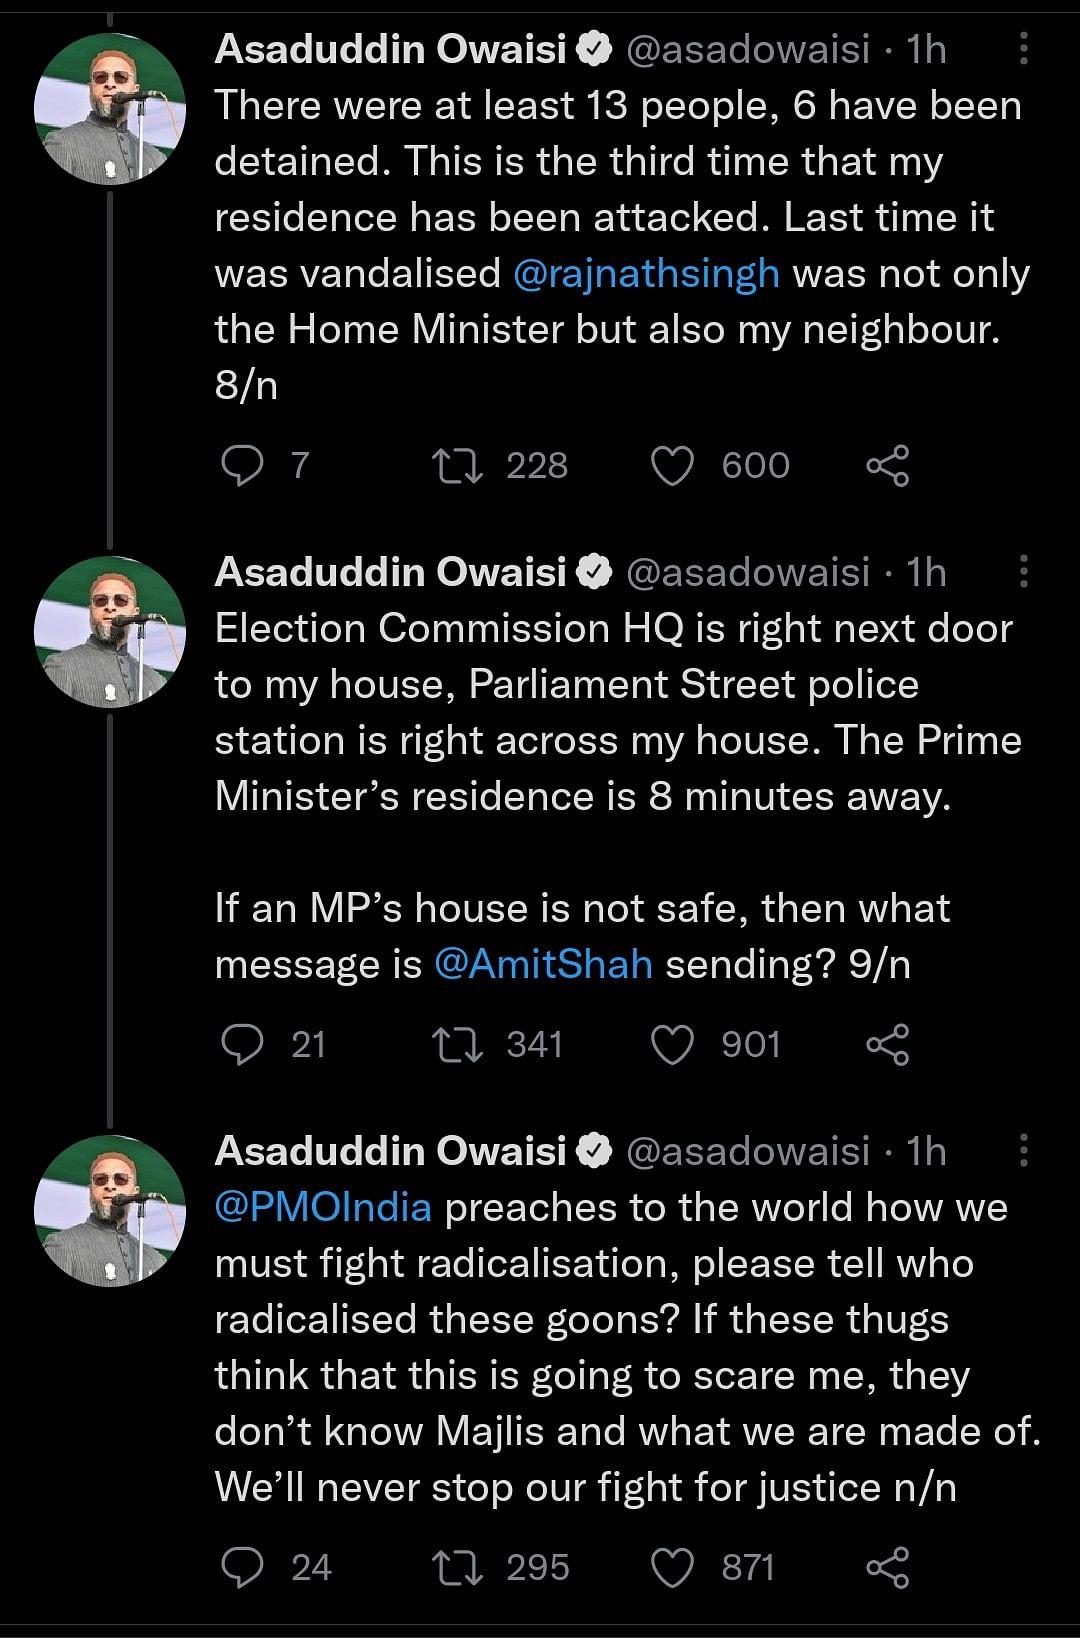 'Who Radicalised Them?' Owaisi Asks After Hindu Sena Allegedly Attacks His Home